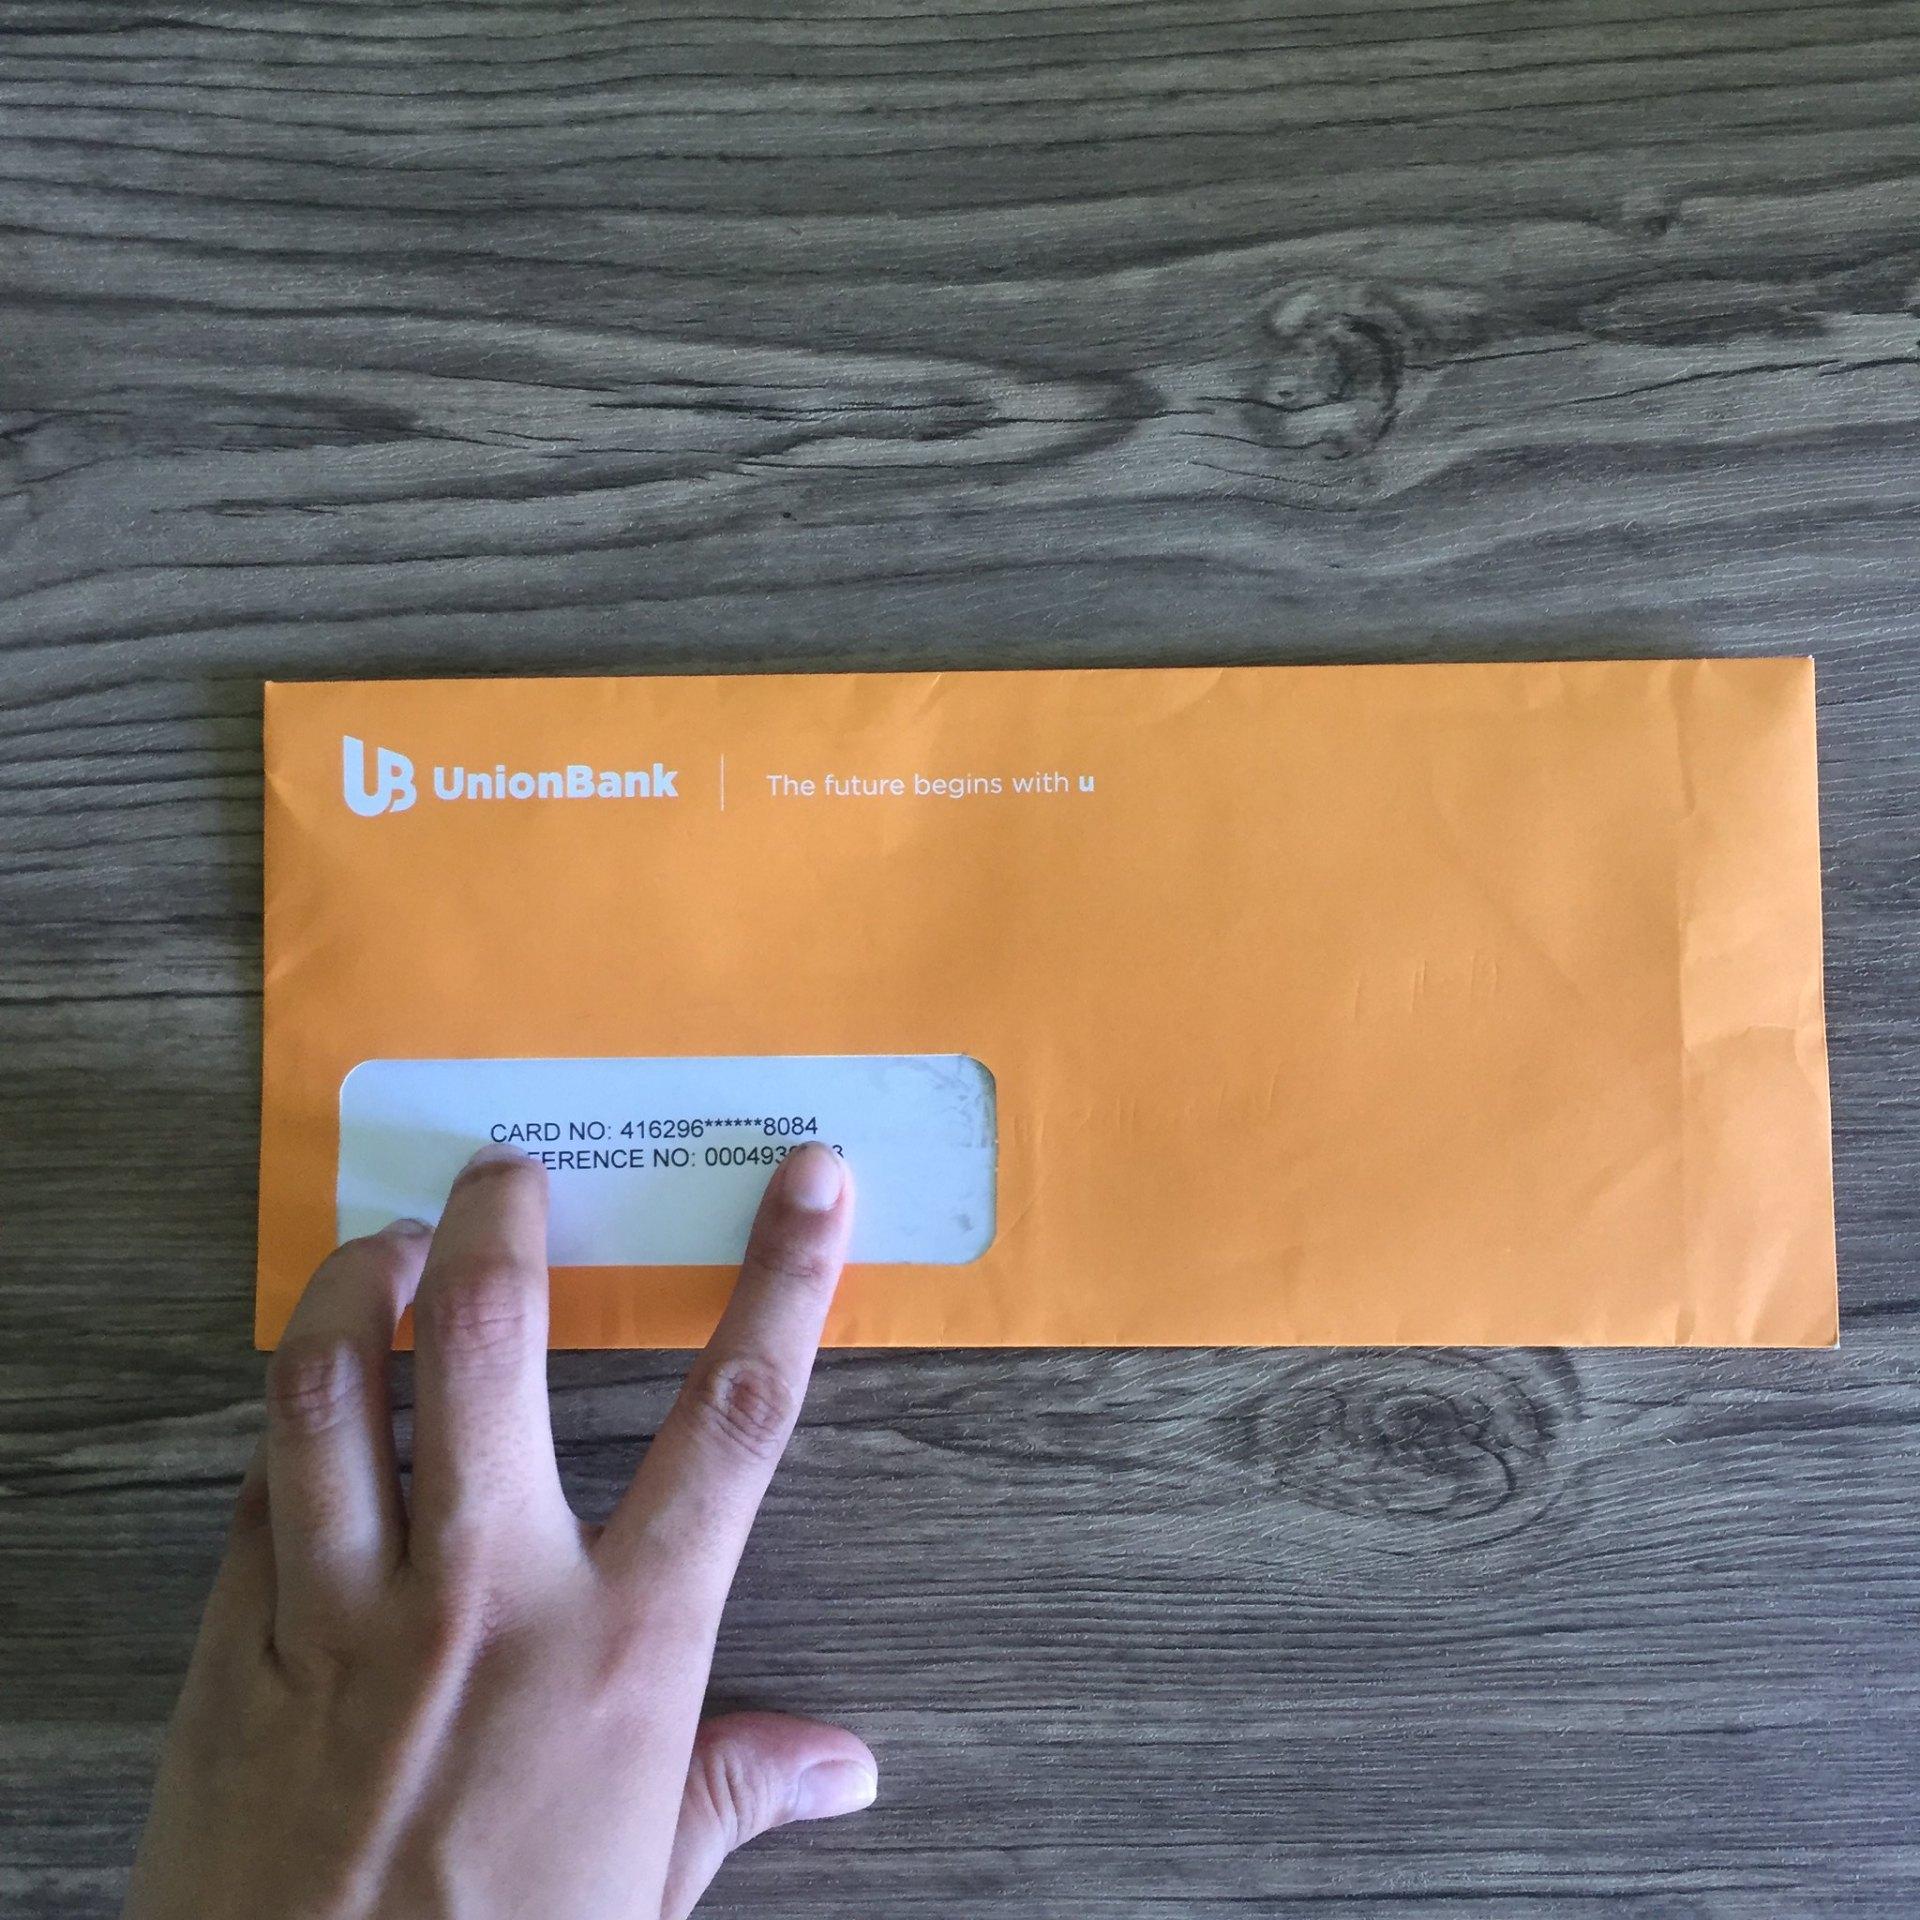 Card was delivered via Mail